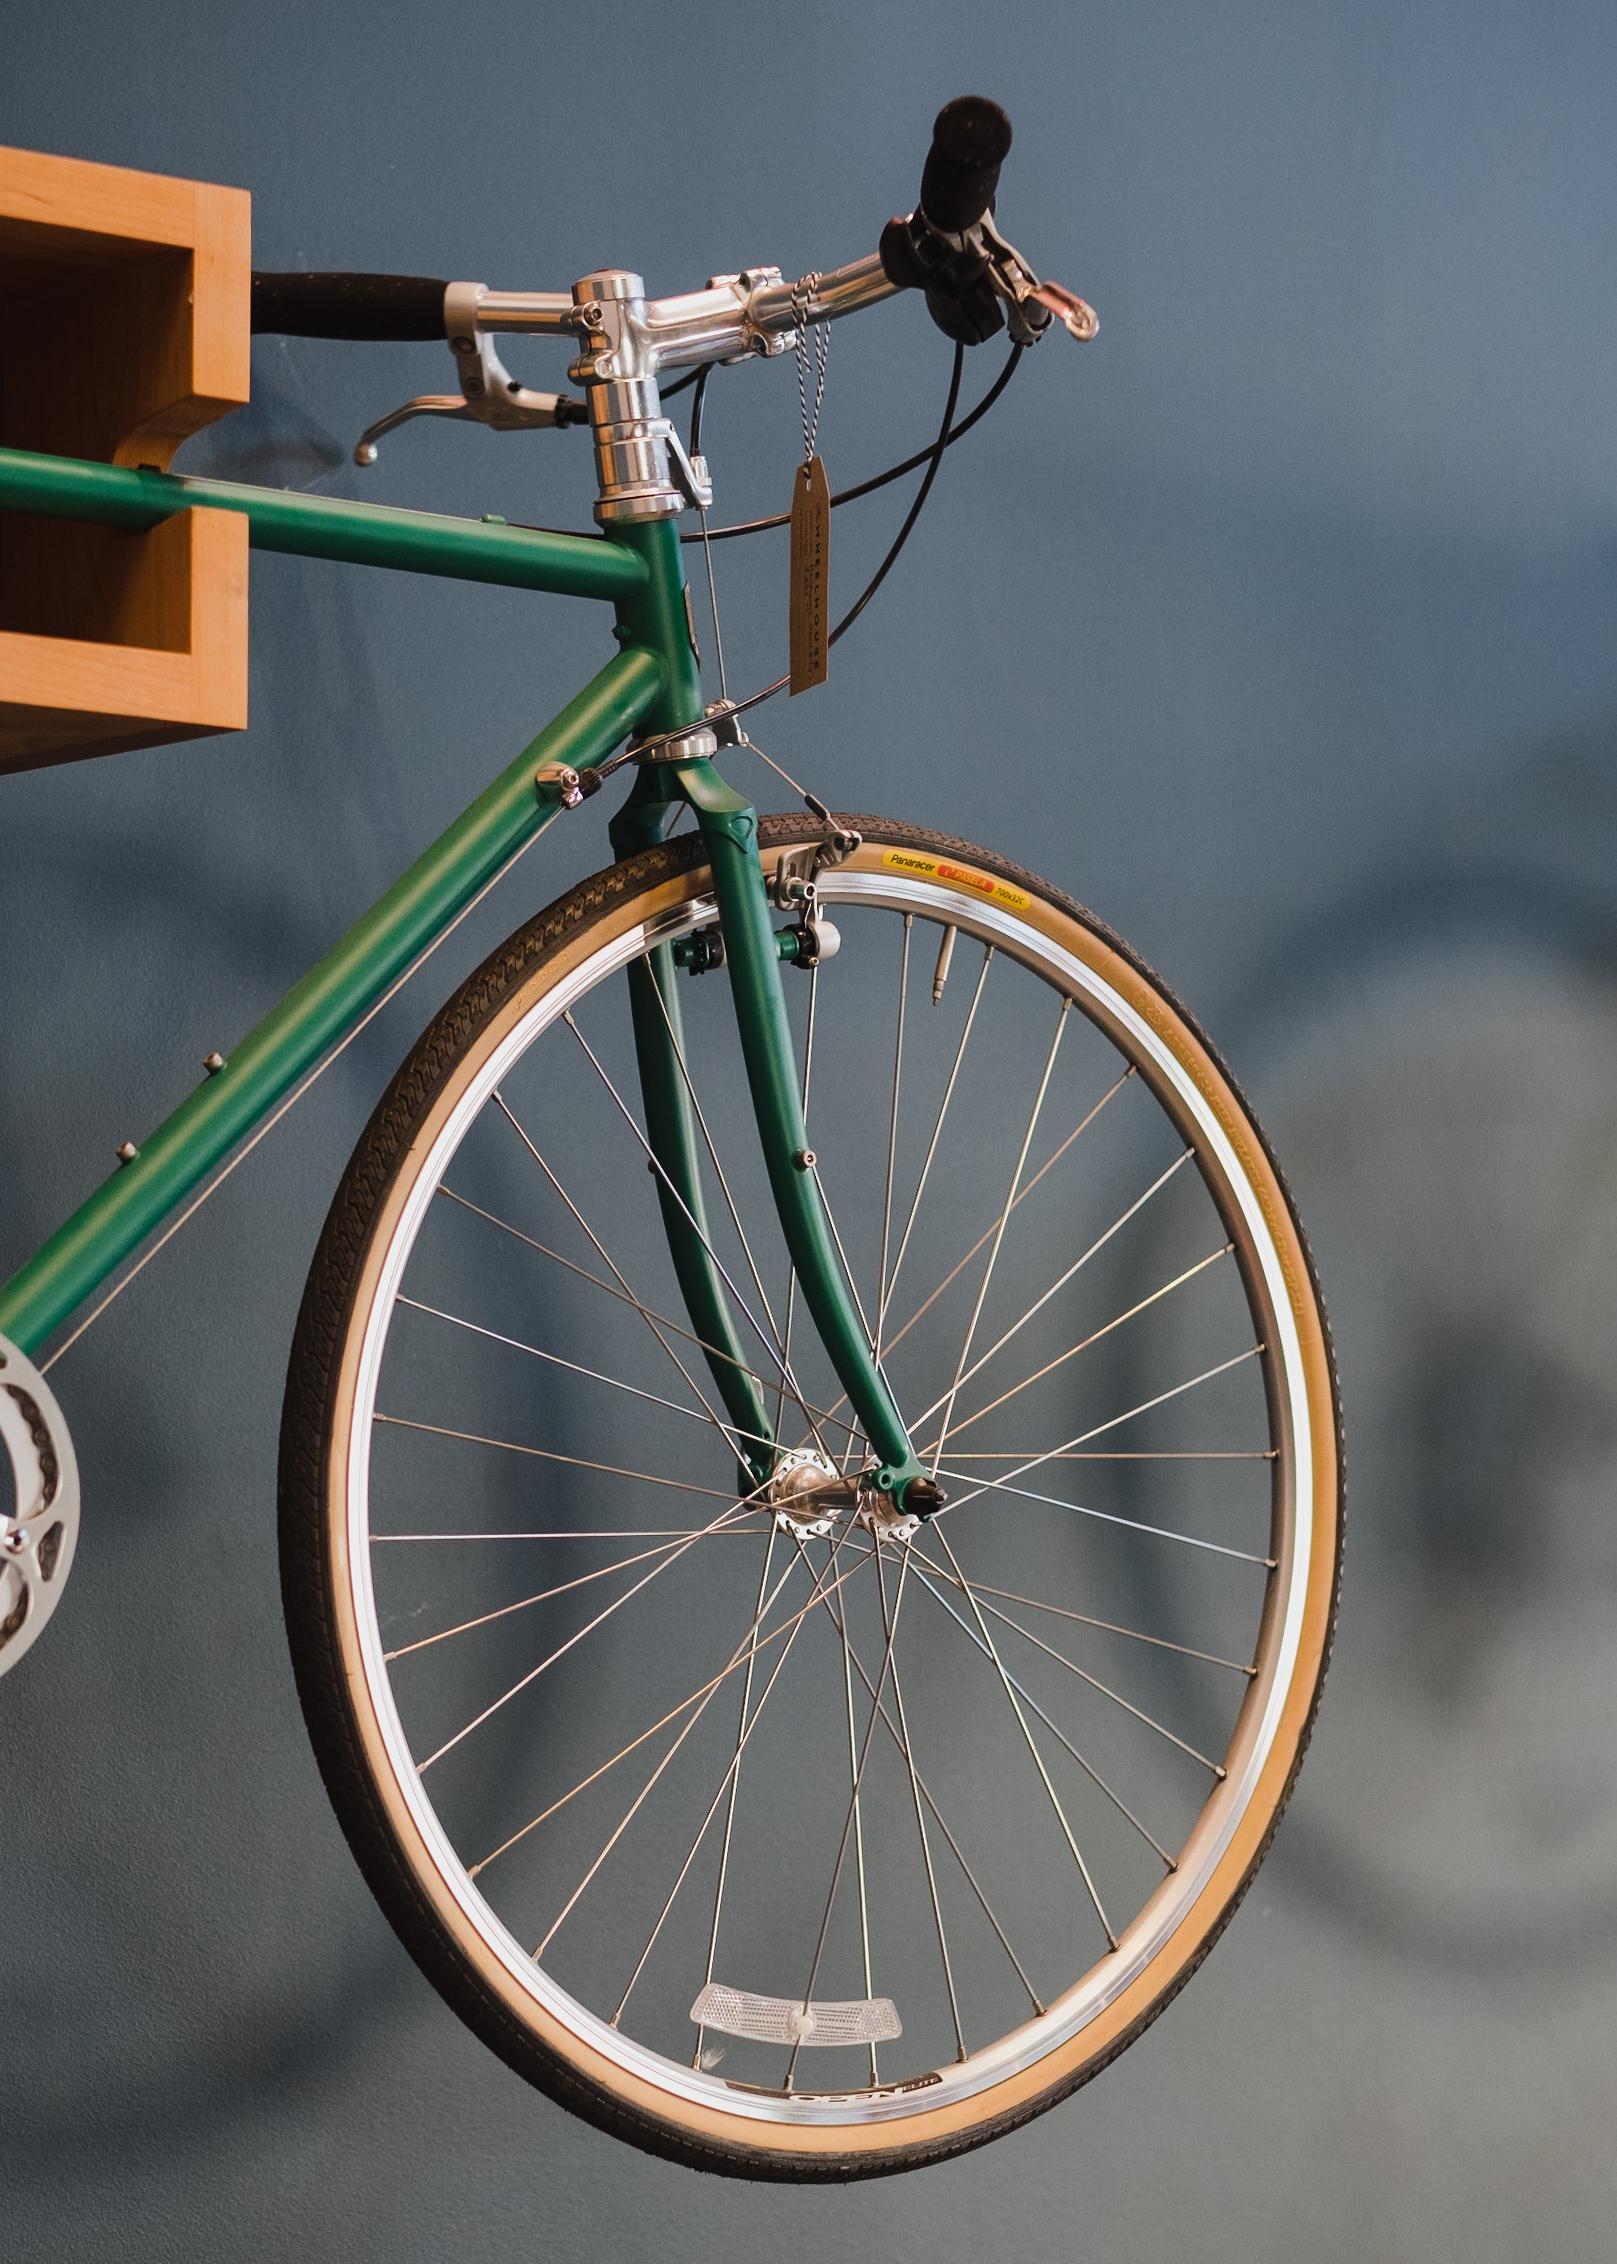 bike-cafe-LA-7981.jpg